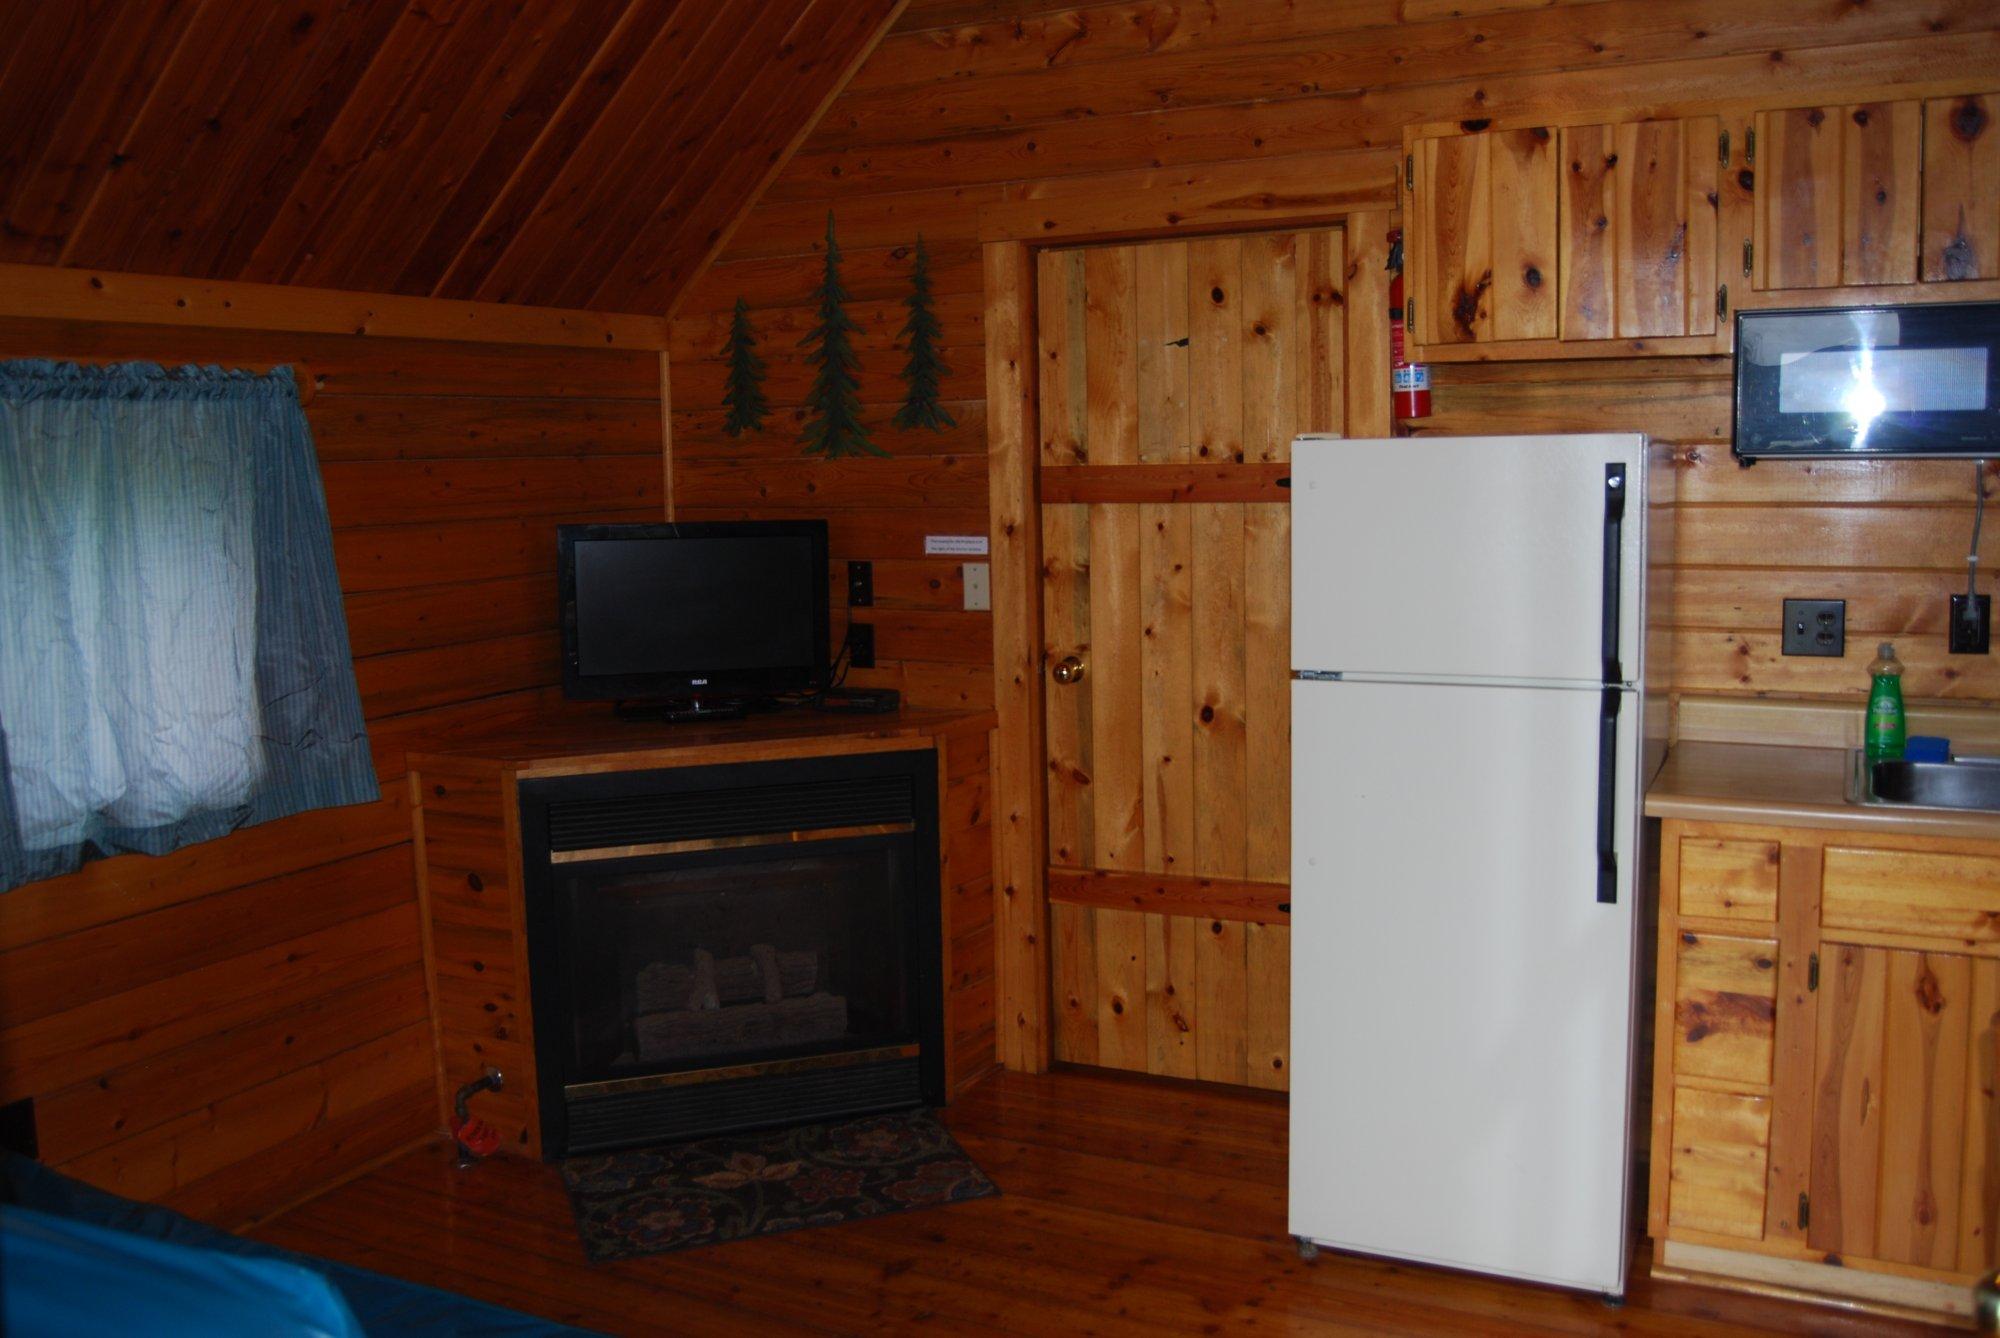 Redwood coast cabins and rv resort between eureka and arcata for Eureka ca cabins